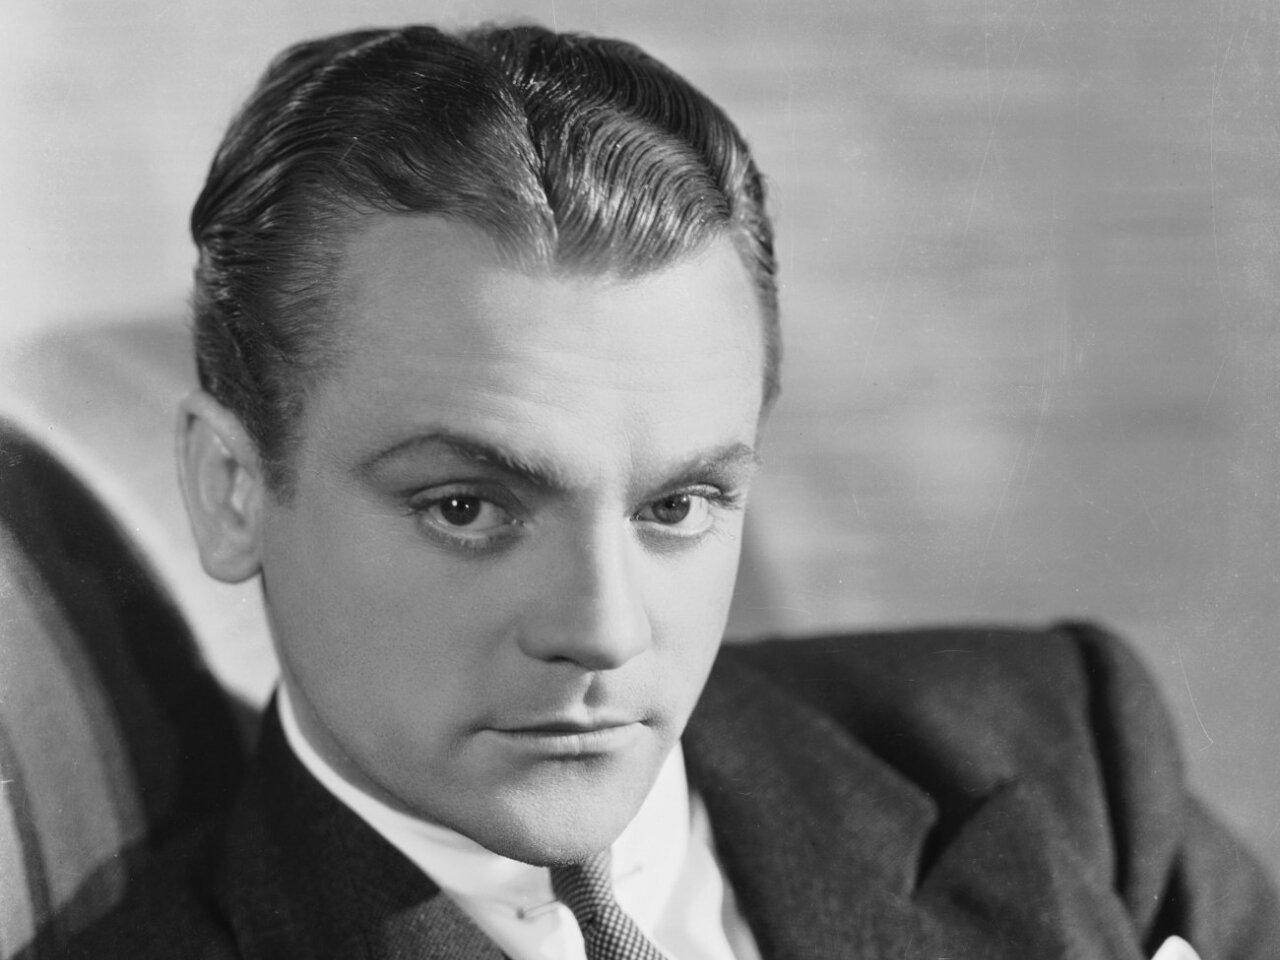 James Cagney Jr. Net Worth